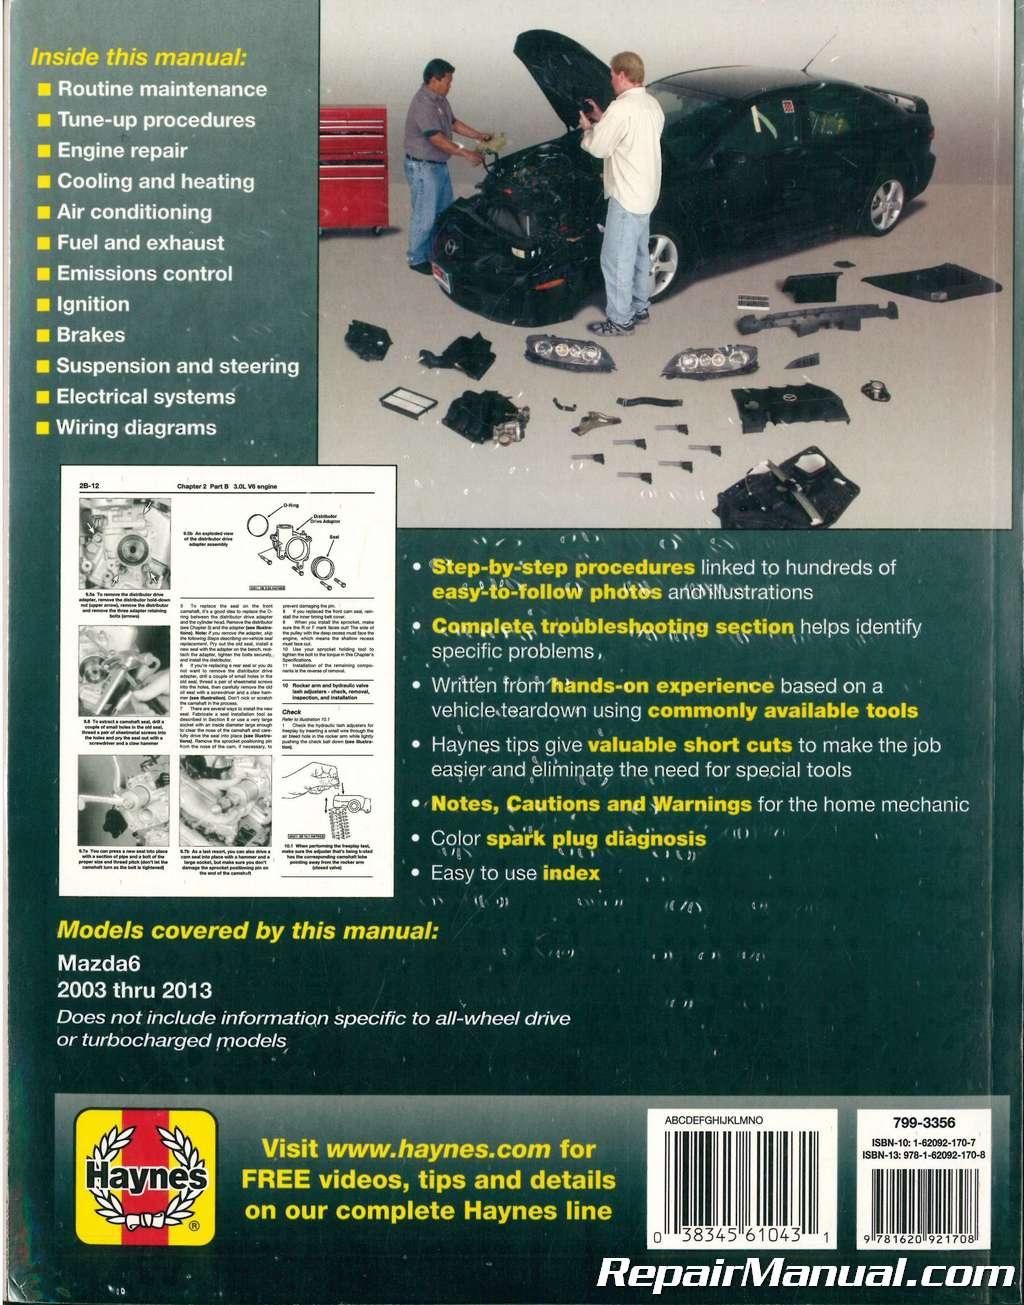 2003-2013 Mazda 6 Haynes Automotive Repair Manual